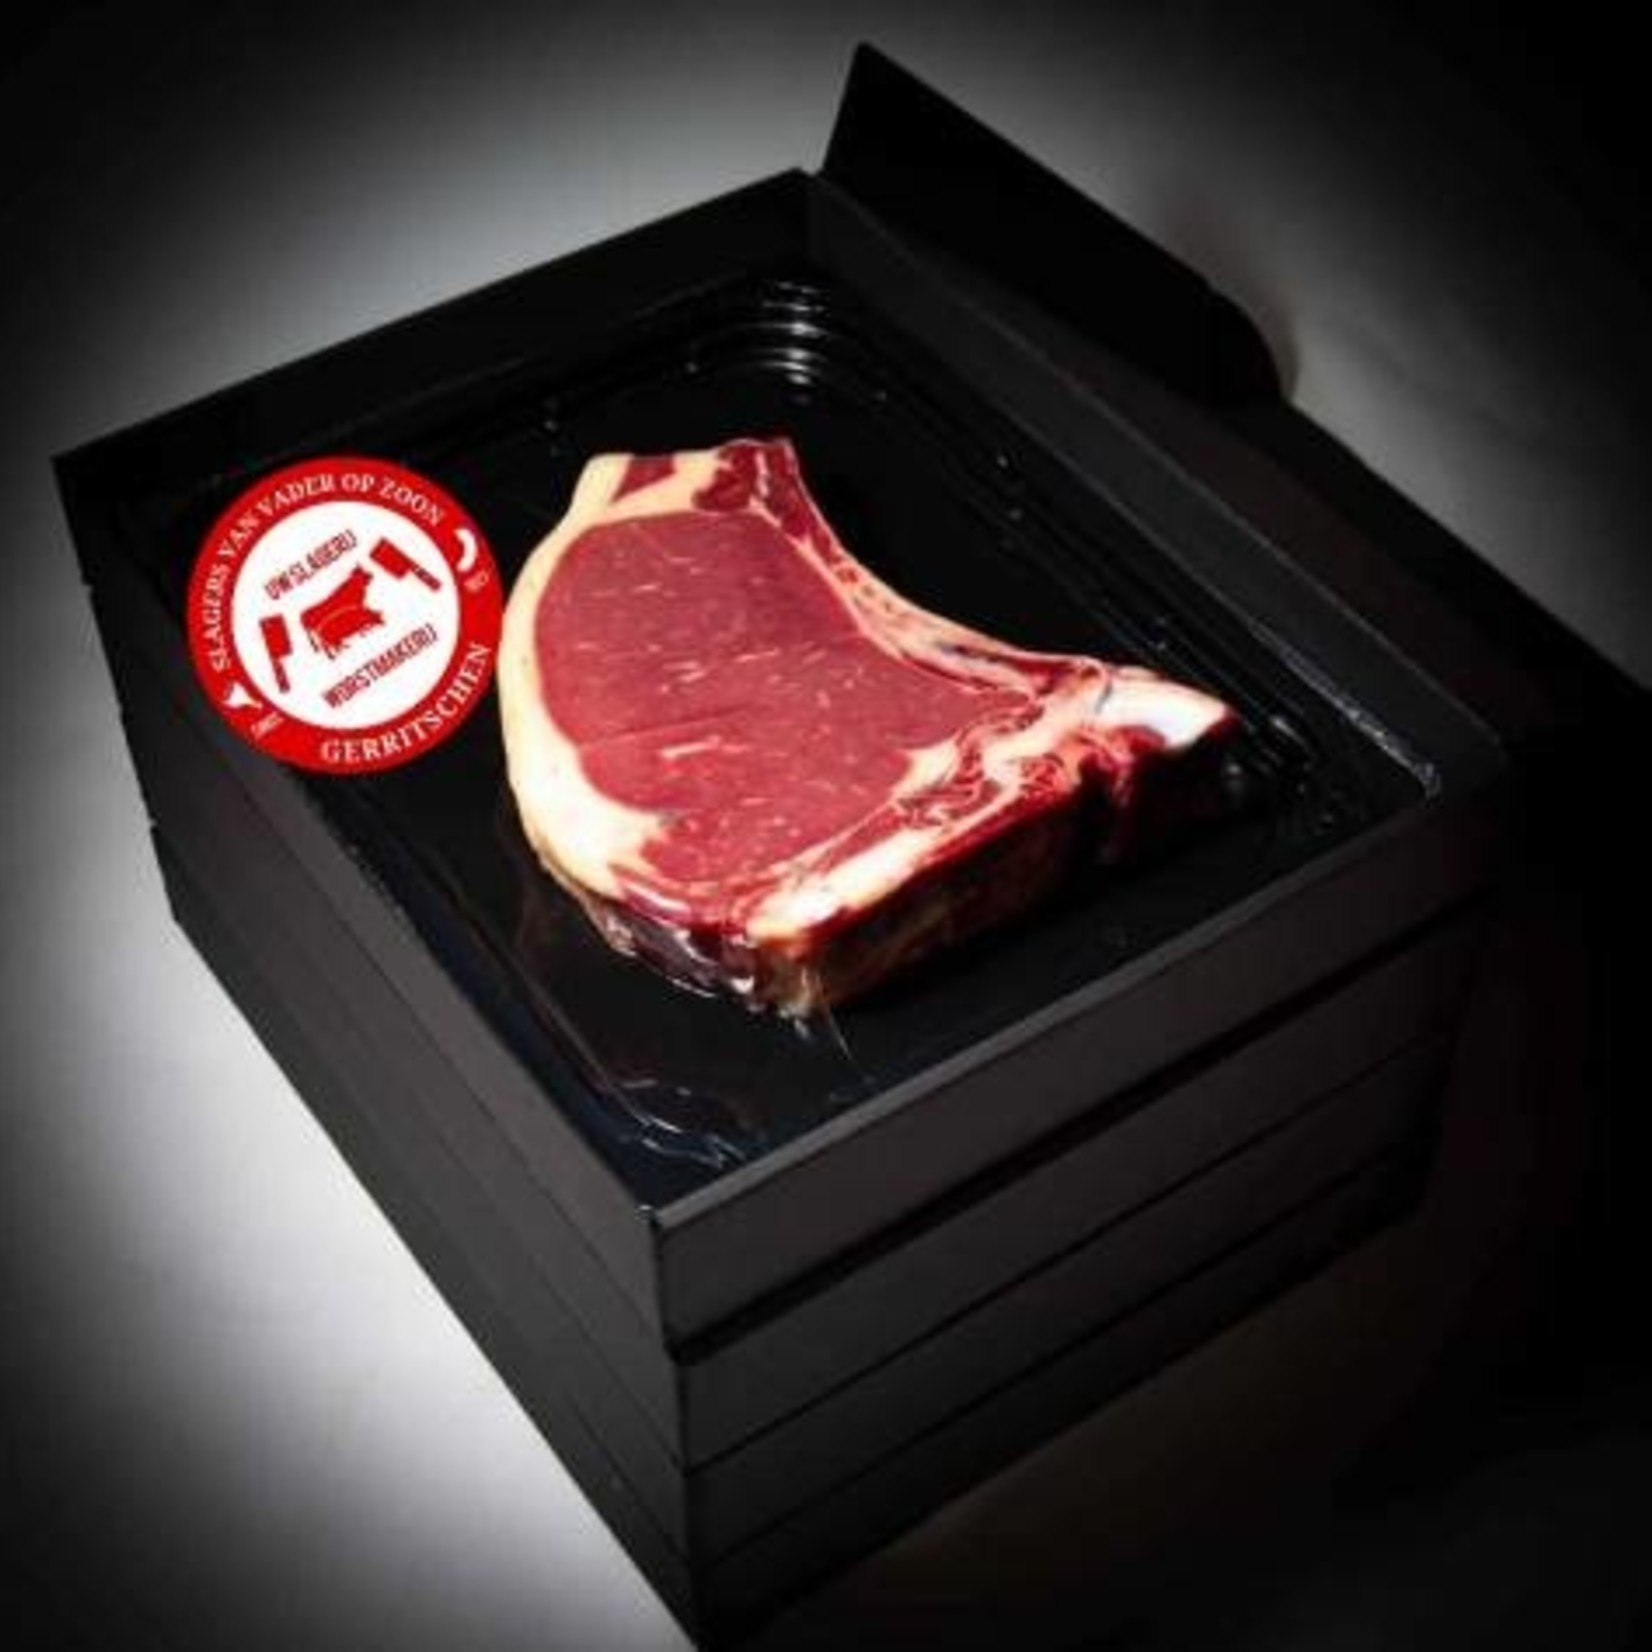 Culinaire Steak, Stoere Mannen Vlees | 1kg (Slagerij Gerritschen)